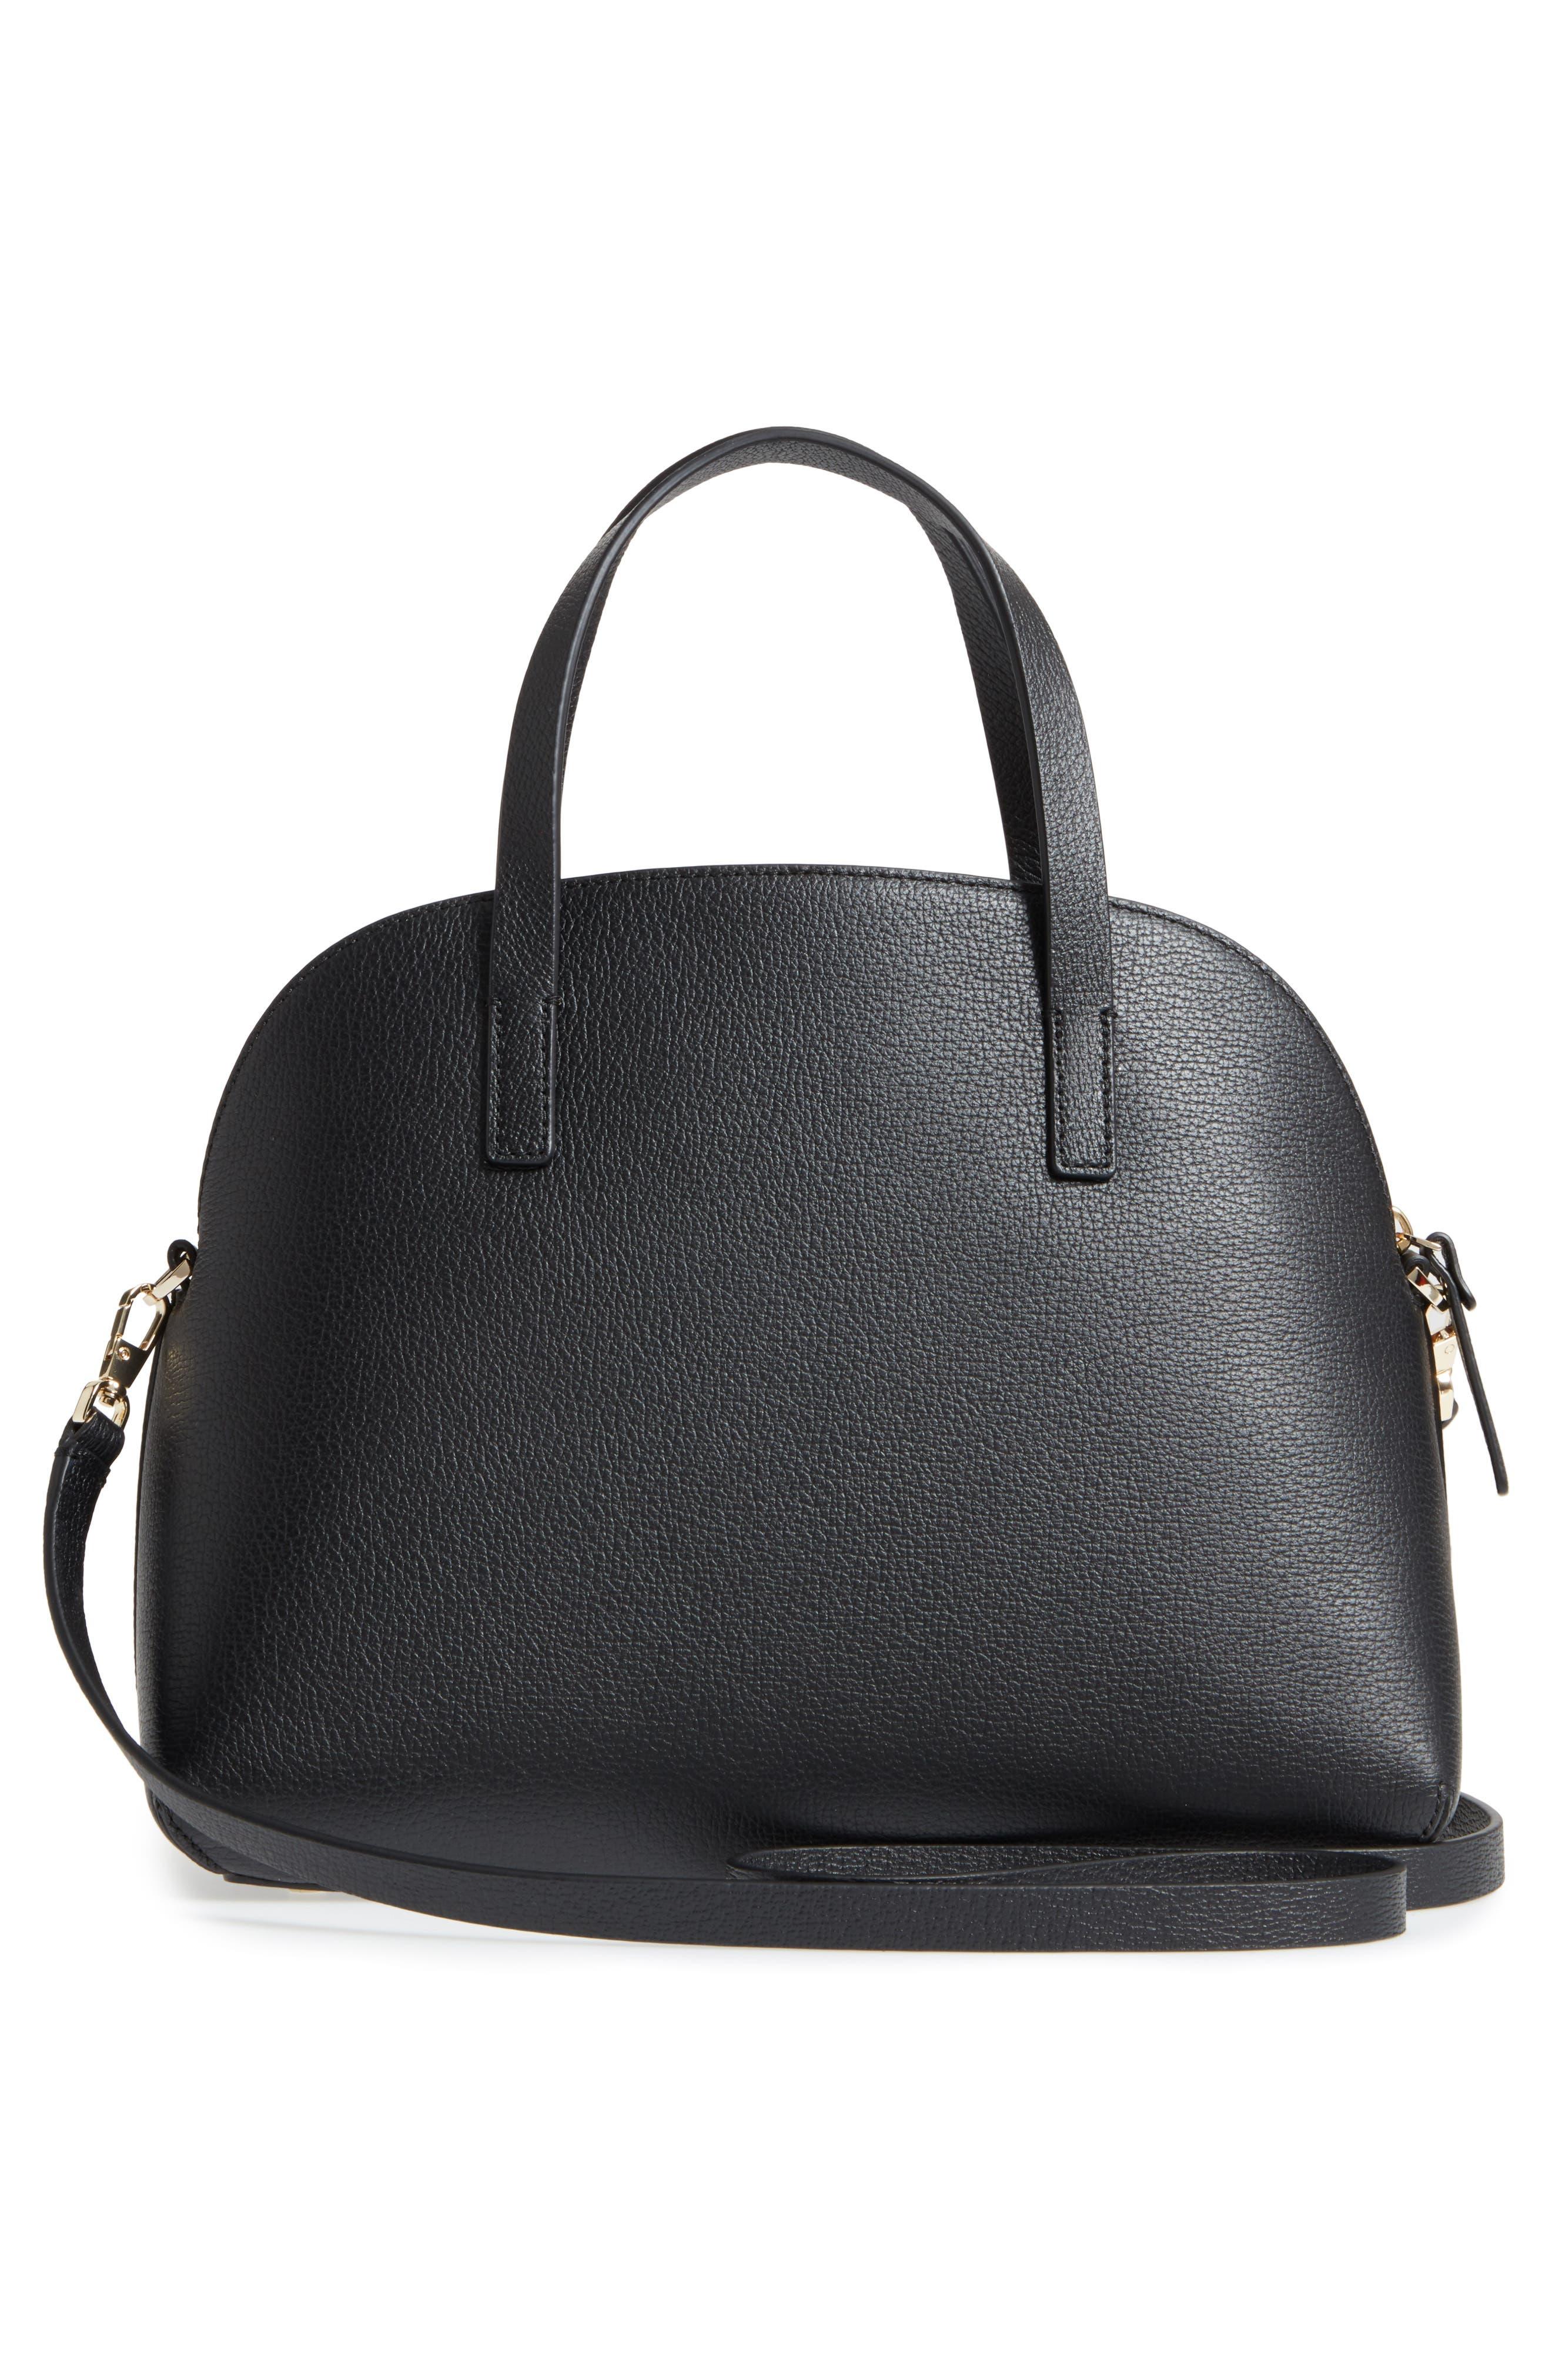 KATE SPADE NEW YORK,                             olive drive lottie leather satchel,                             Alternate thumbnail 3, color,                             001